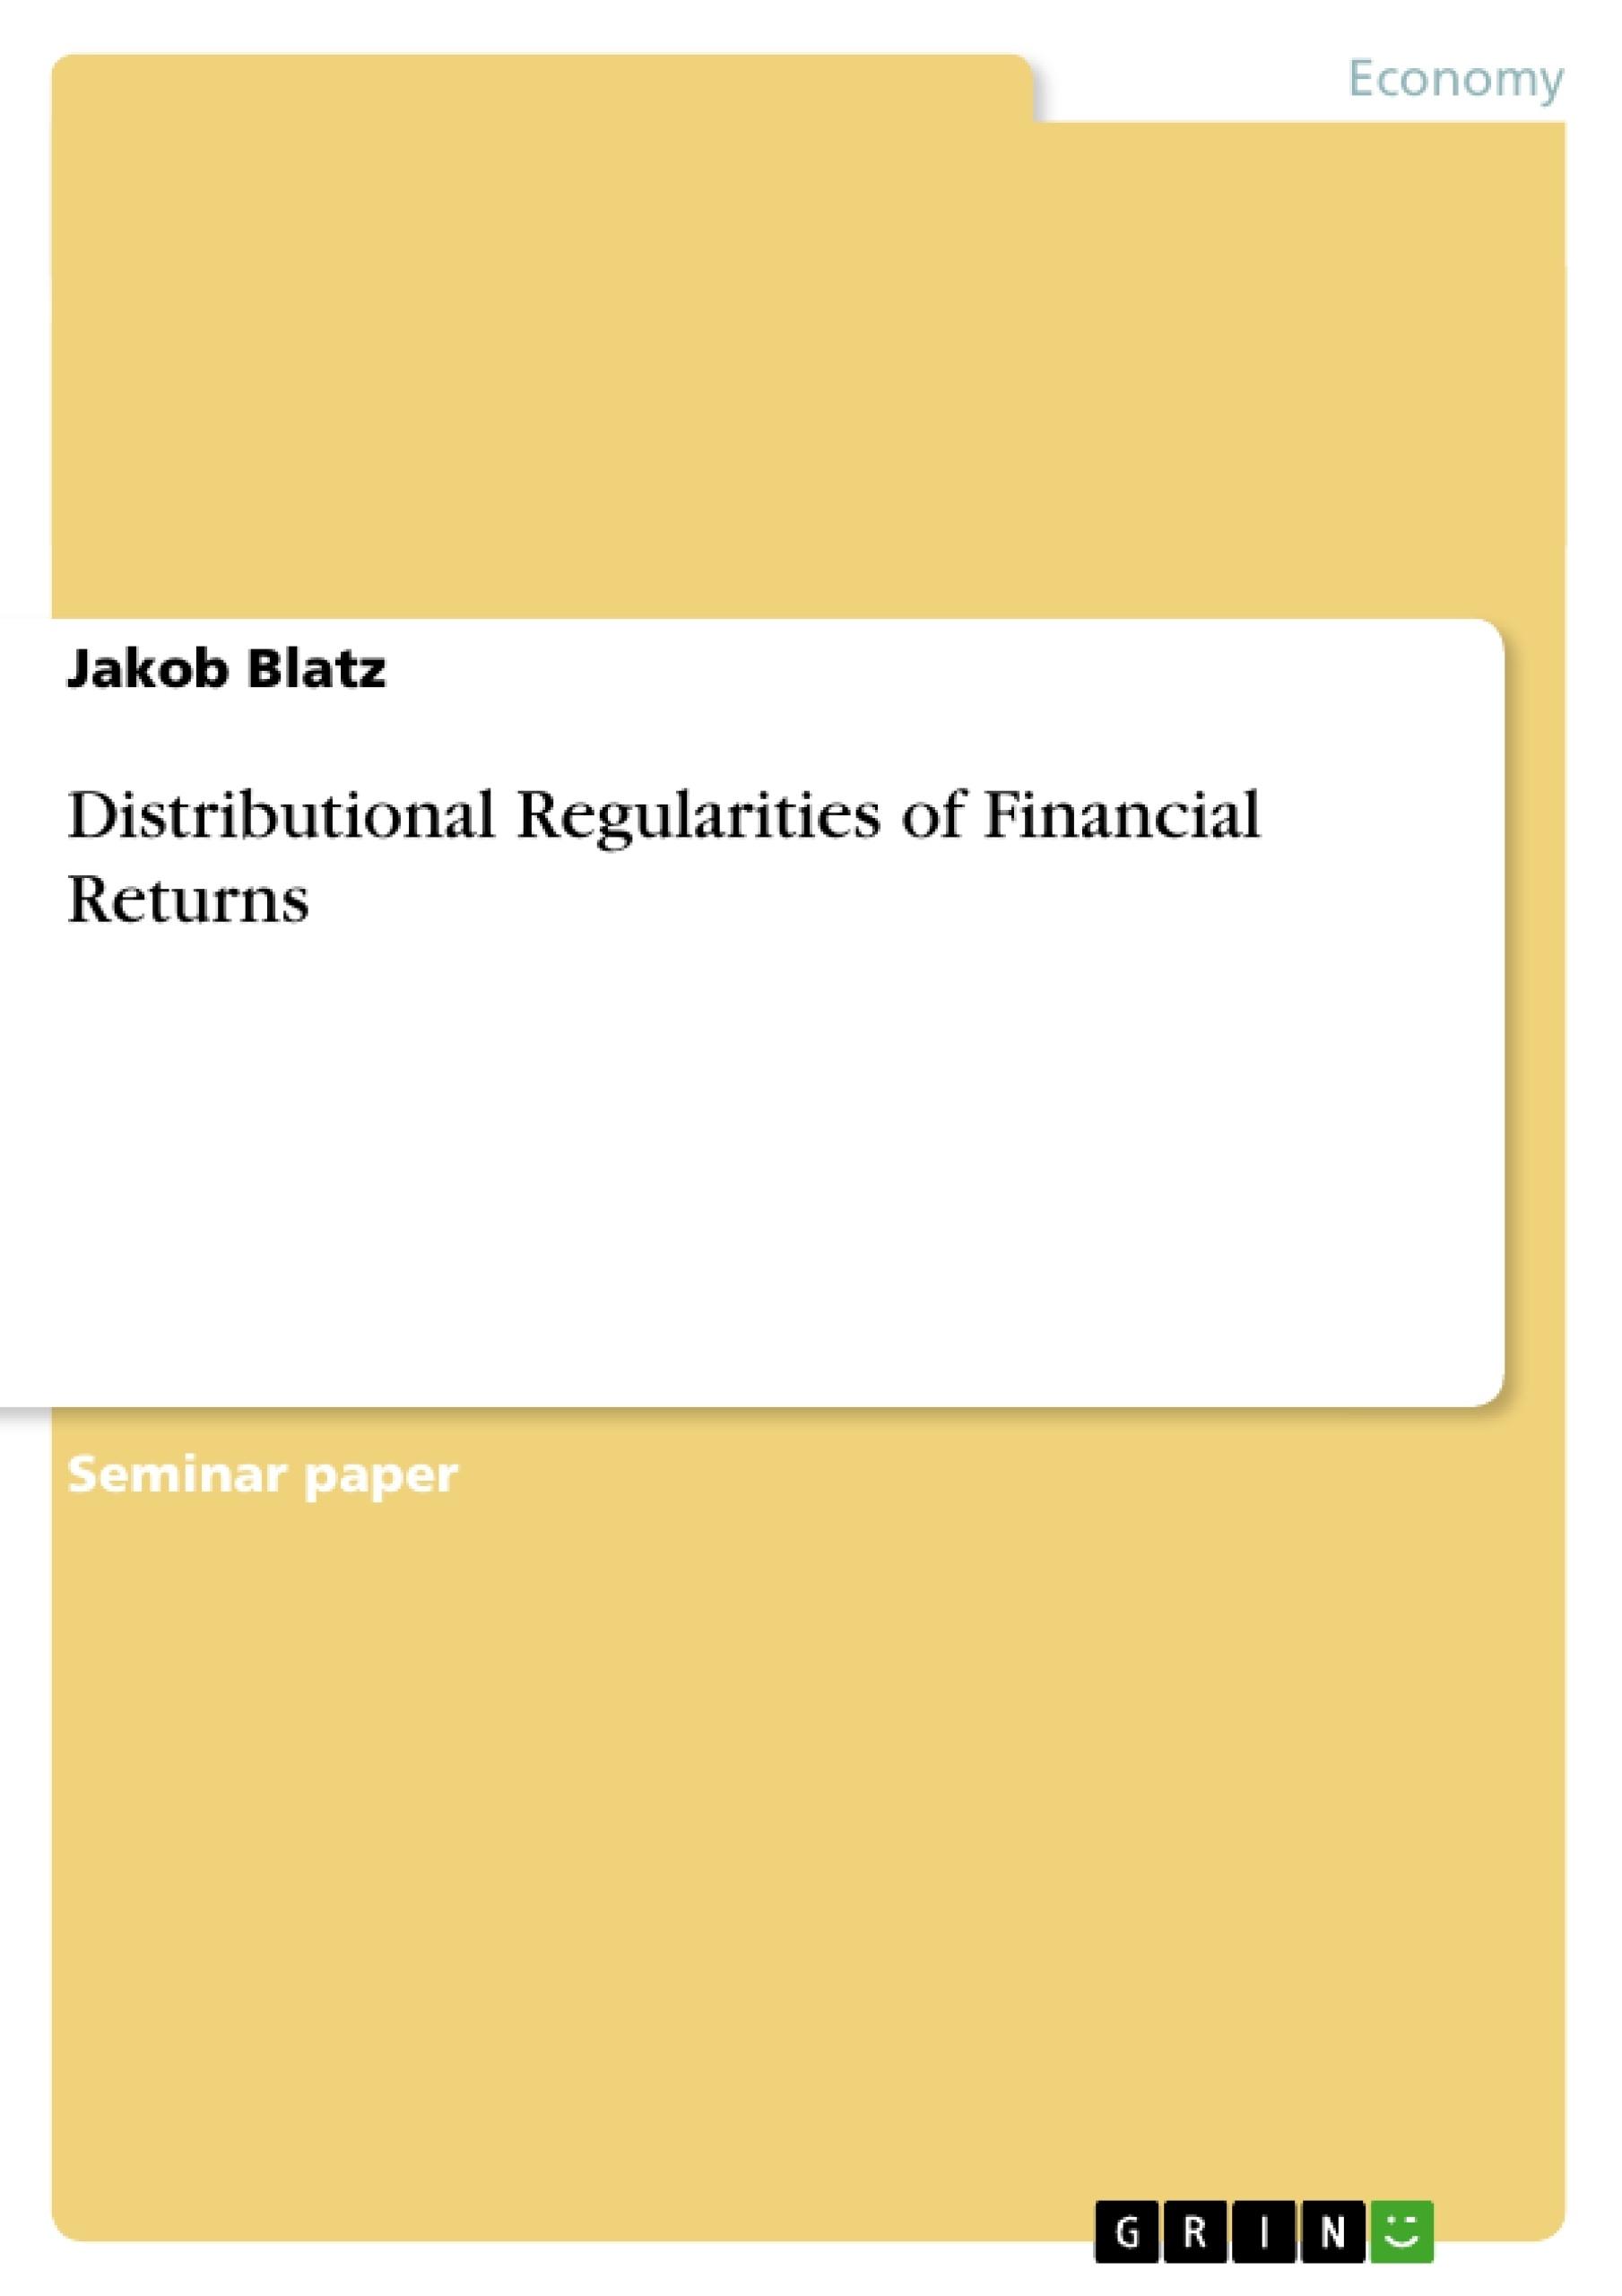 Title: Distributional Regularities of Financial Returns